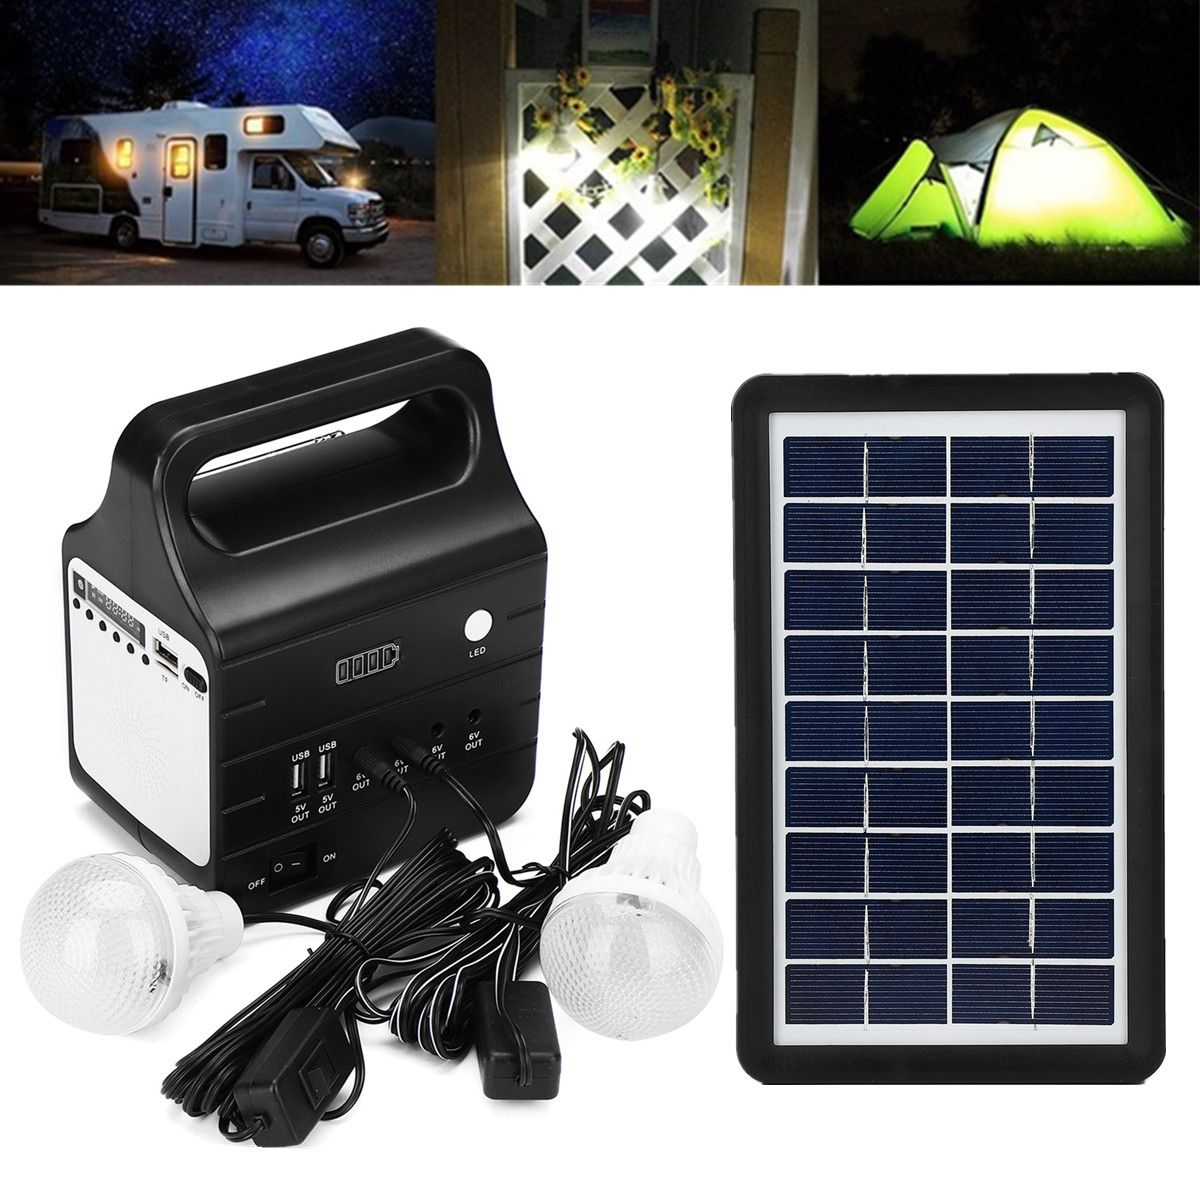 25W Solar Generator FM Support Stereo Speaker Multi-functional Generators With Solar Power Panel 2xLED Bulb Solar-charging